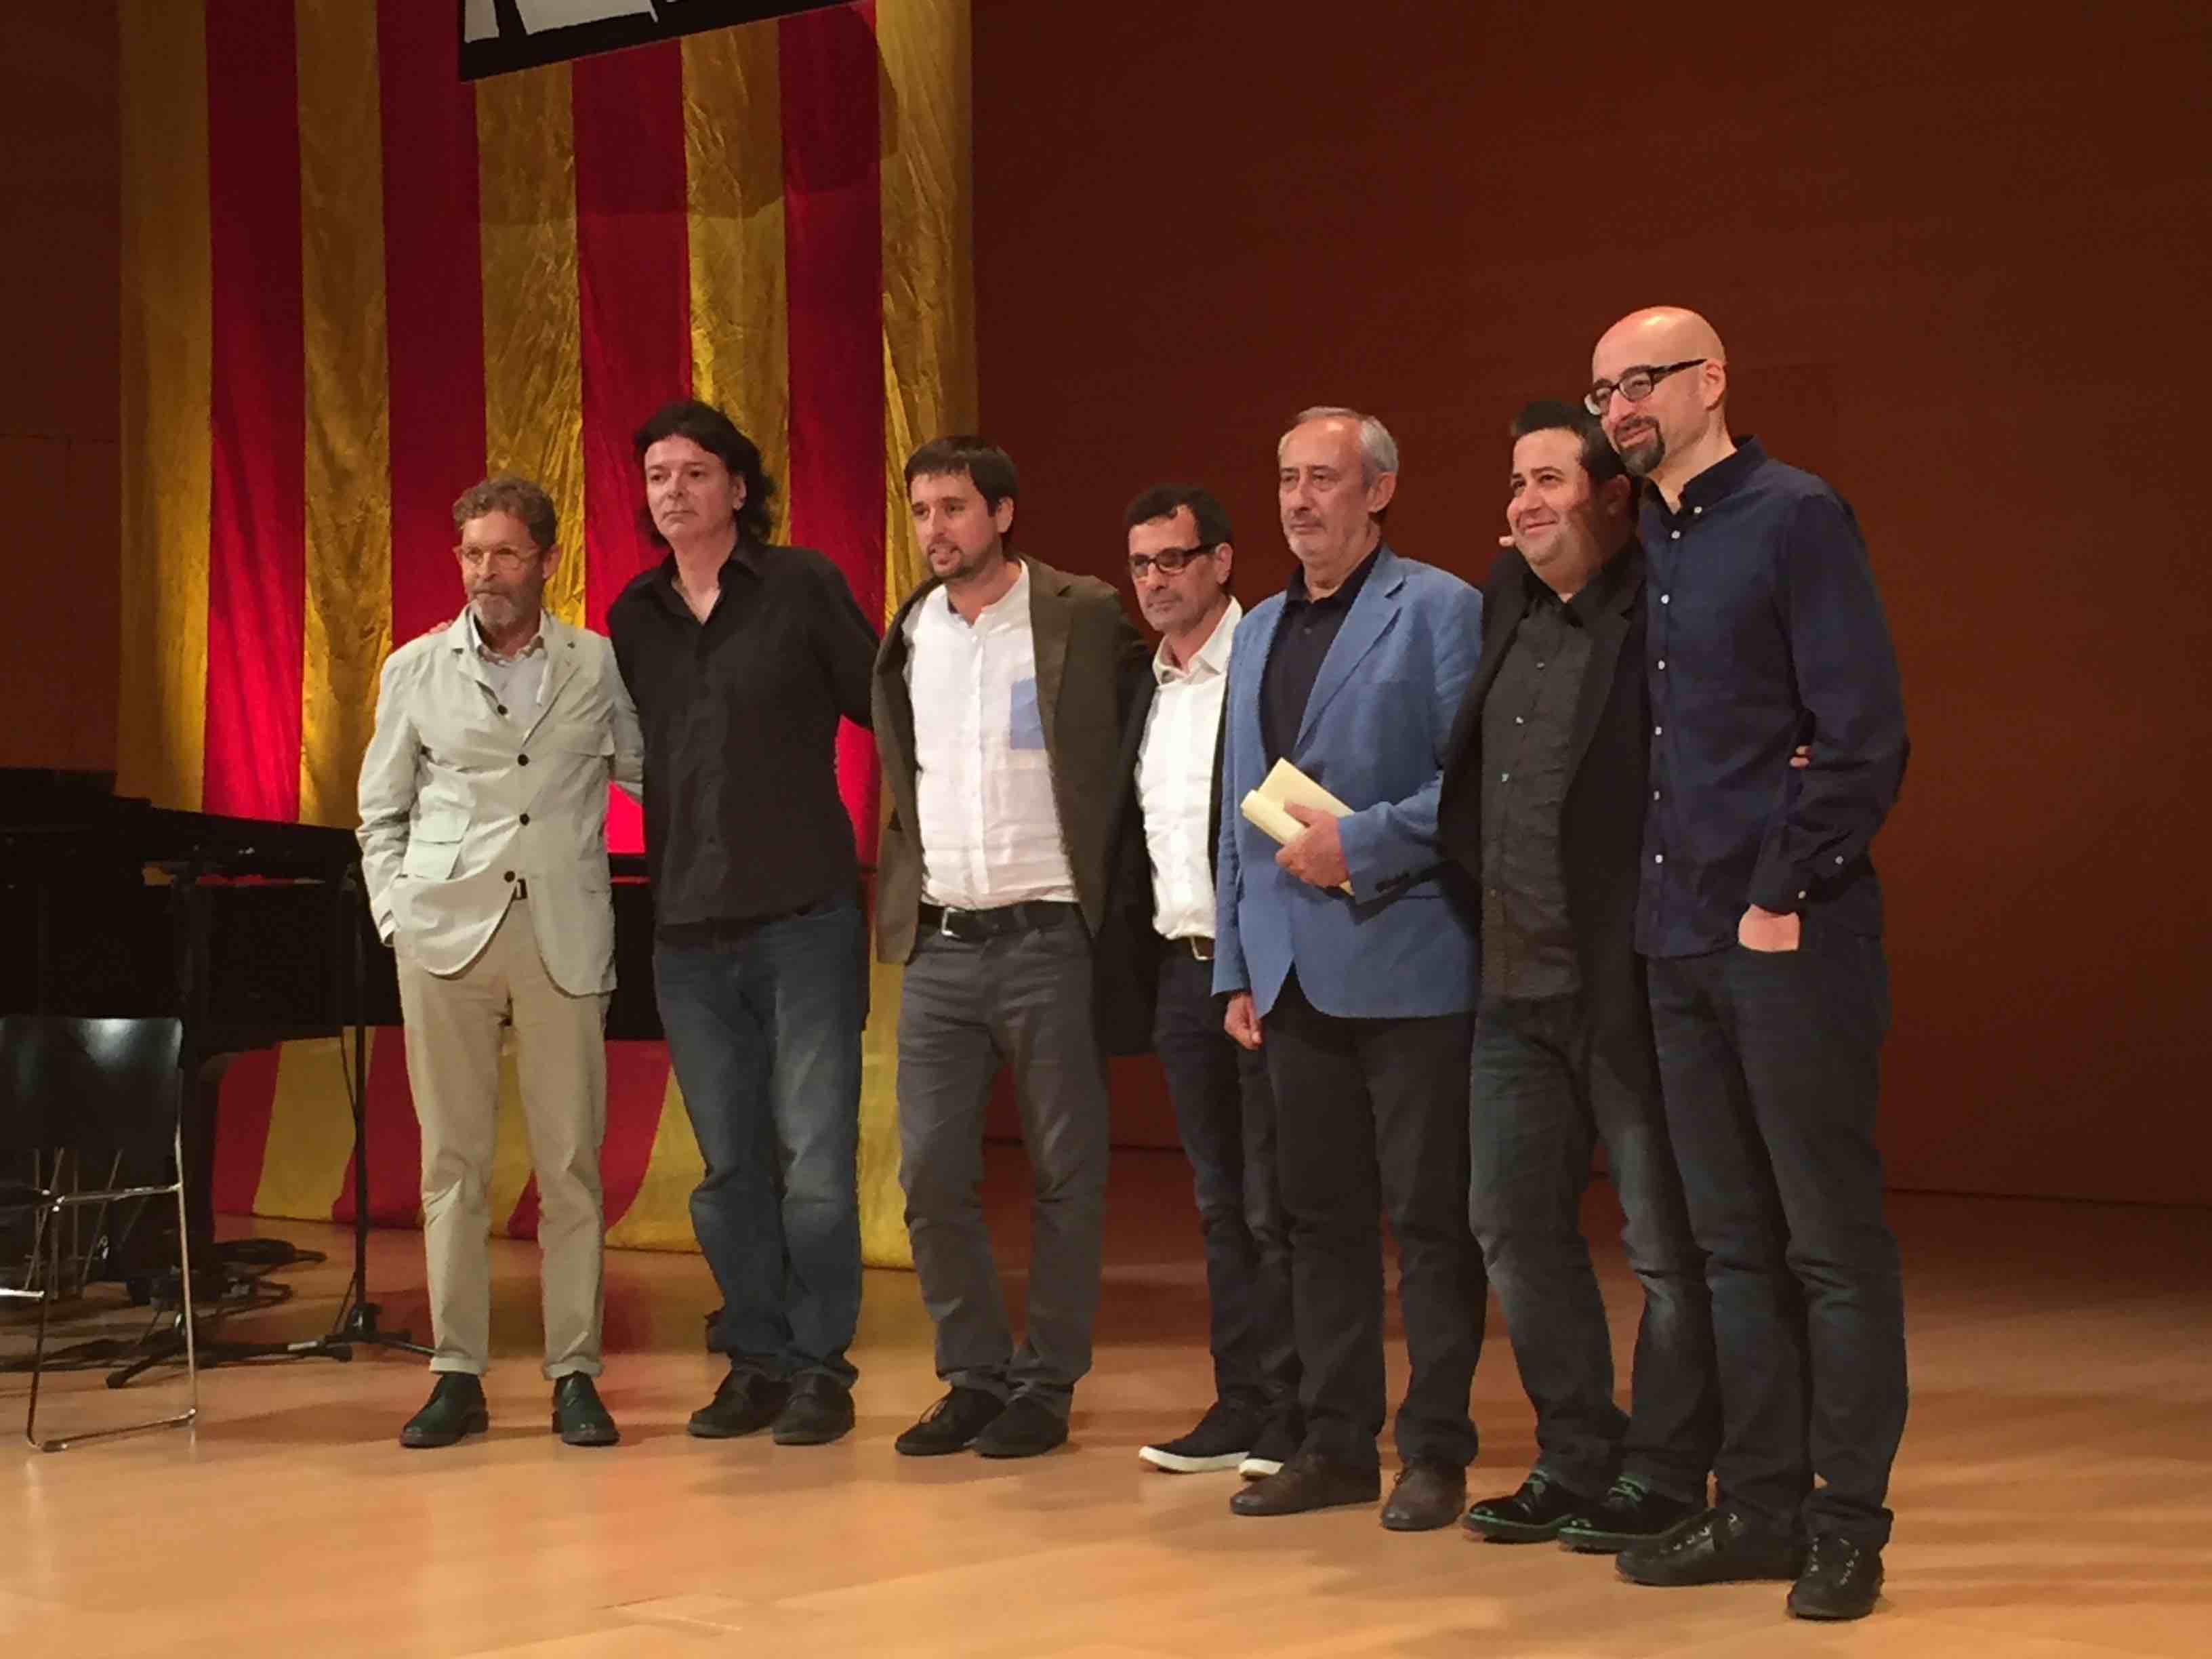 premis-literaris-de-girona-2016-3